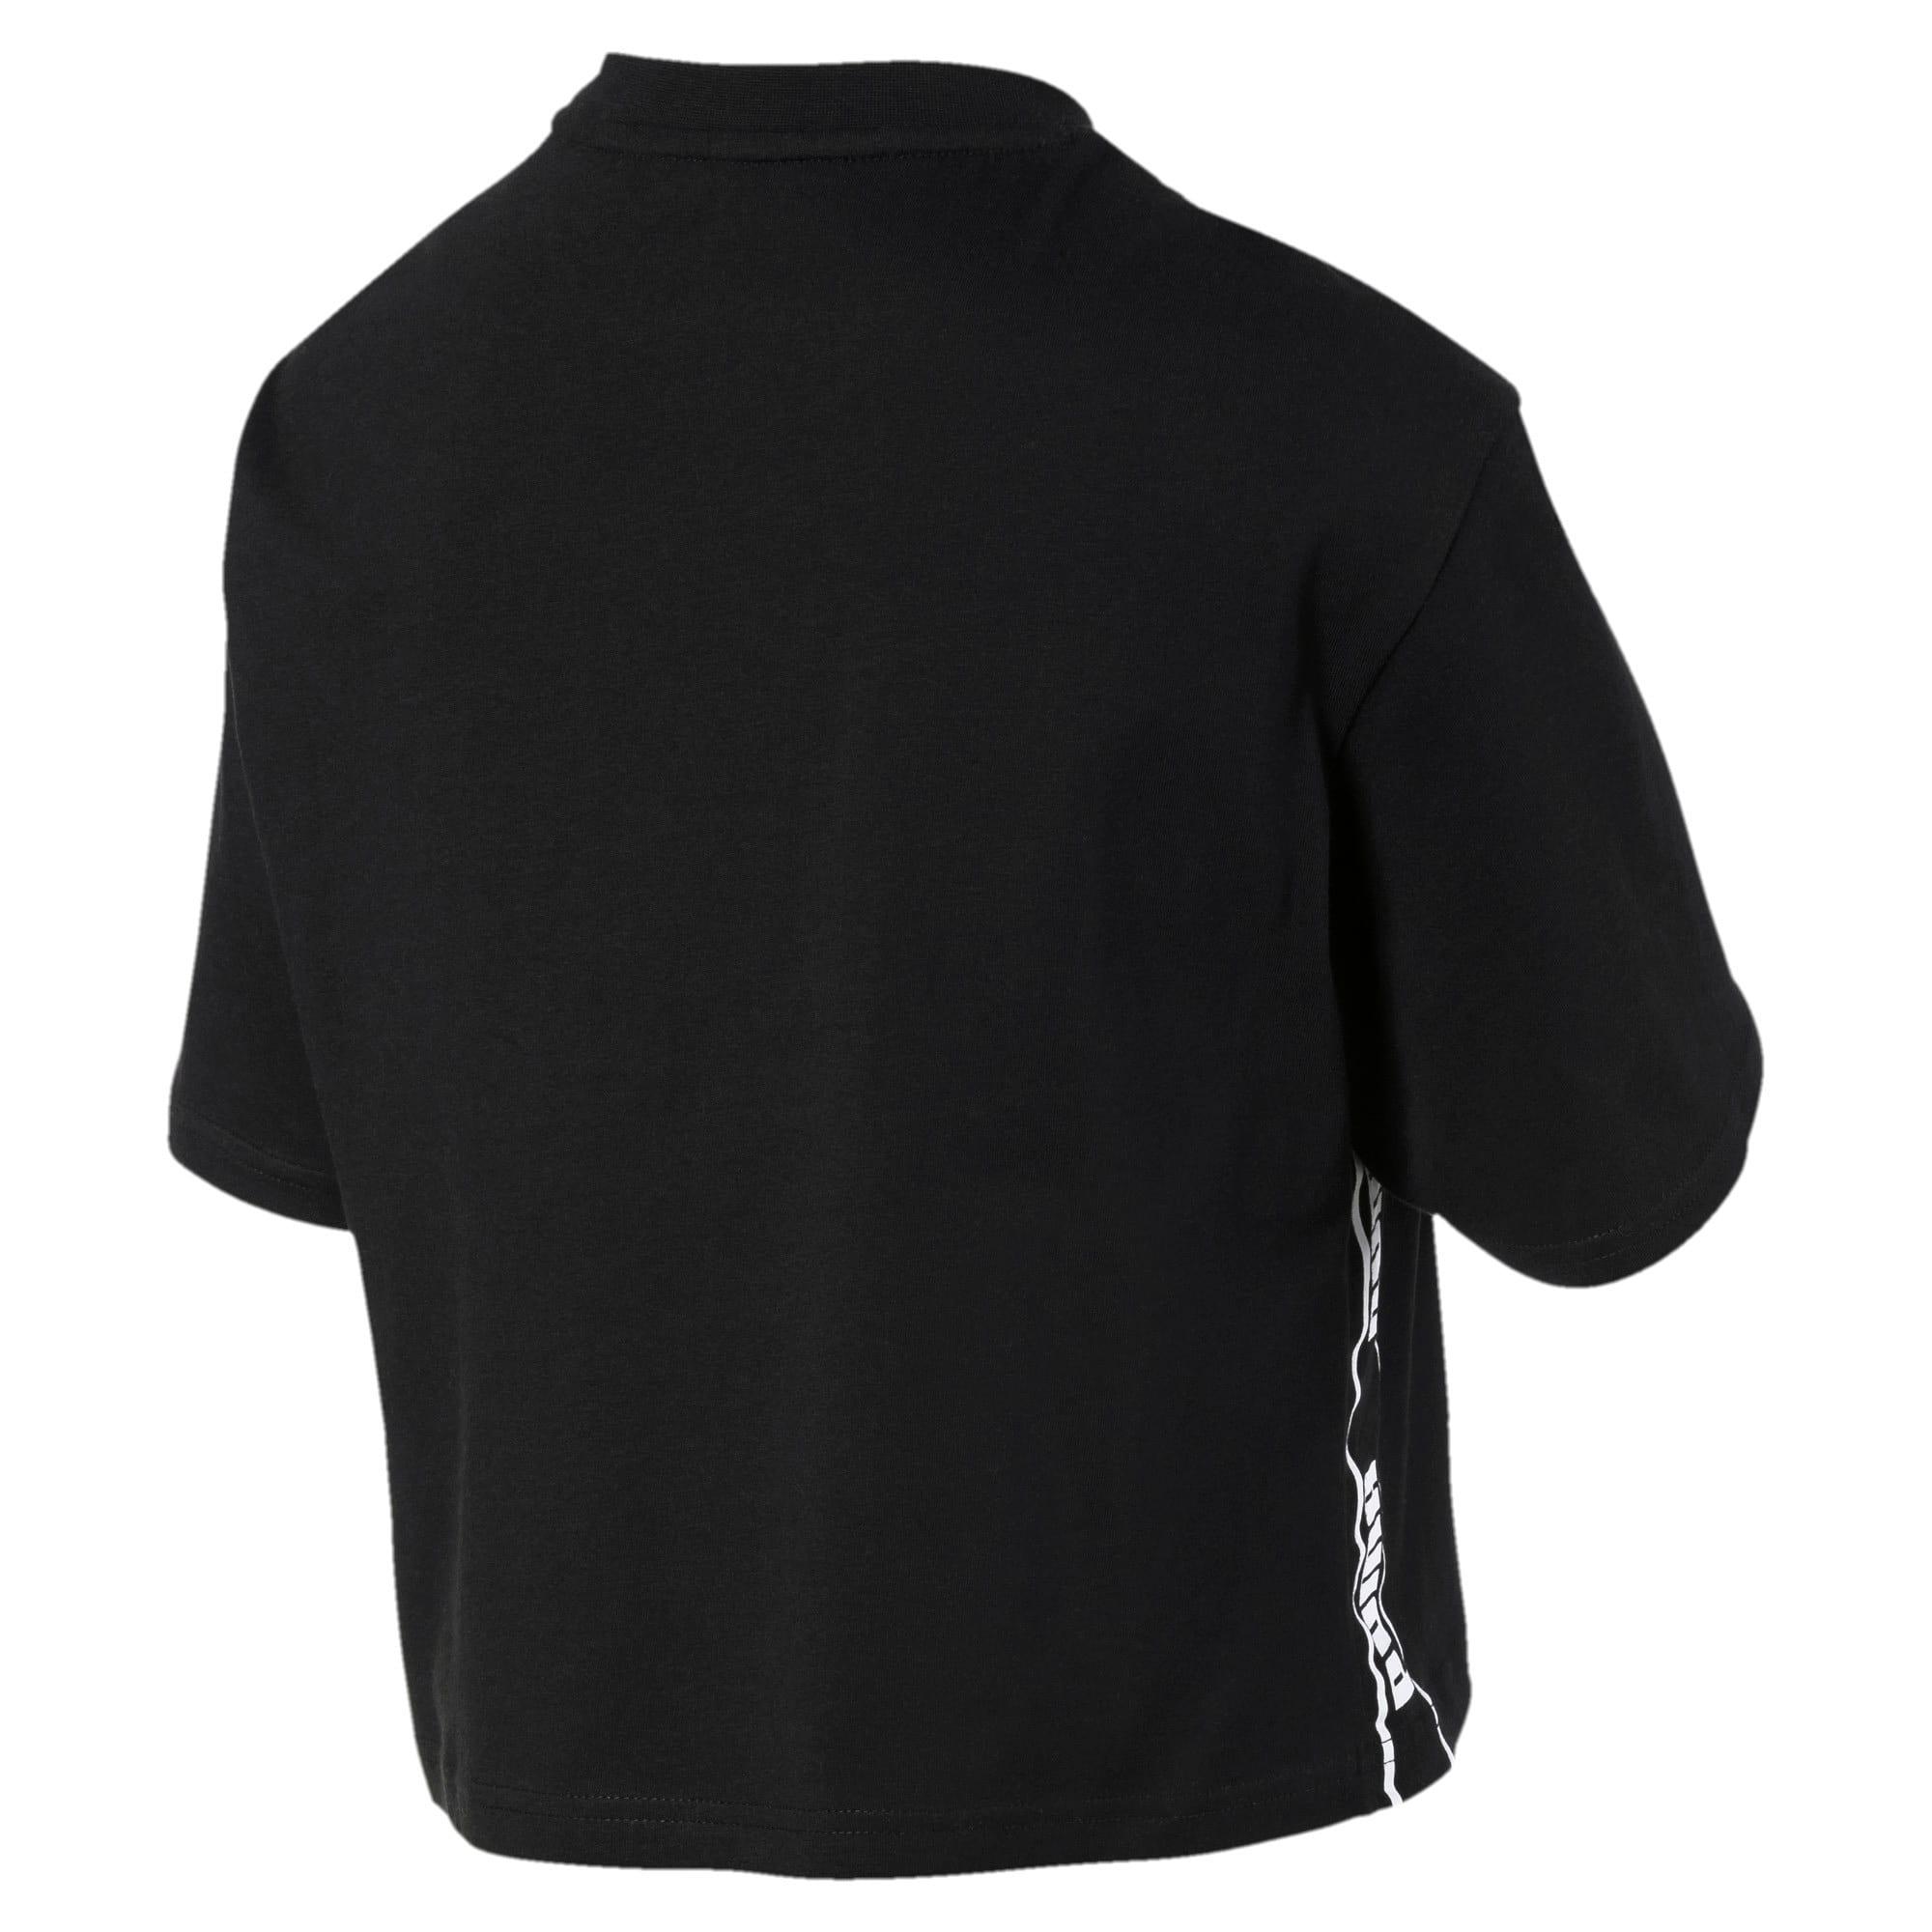 Miniatura 5 de Camiseta corta Amplified para mujer, Puma Black, mediano